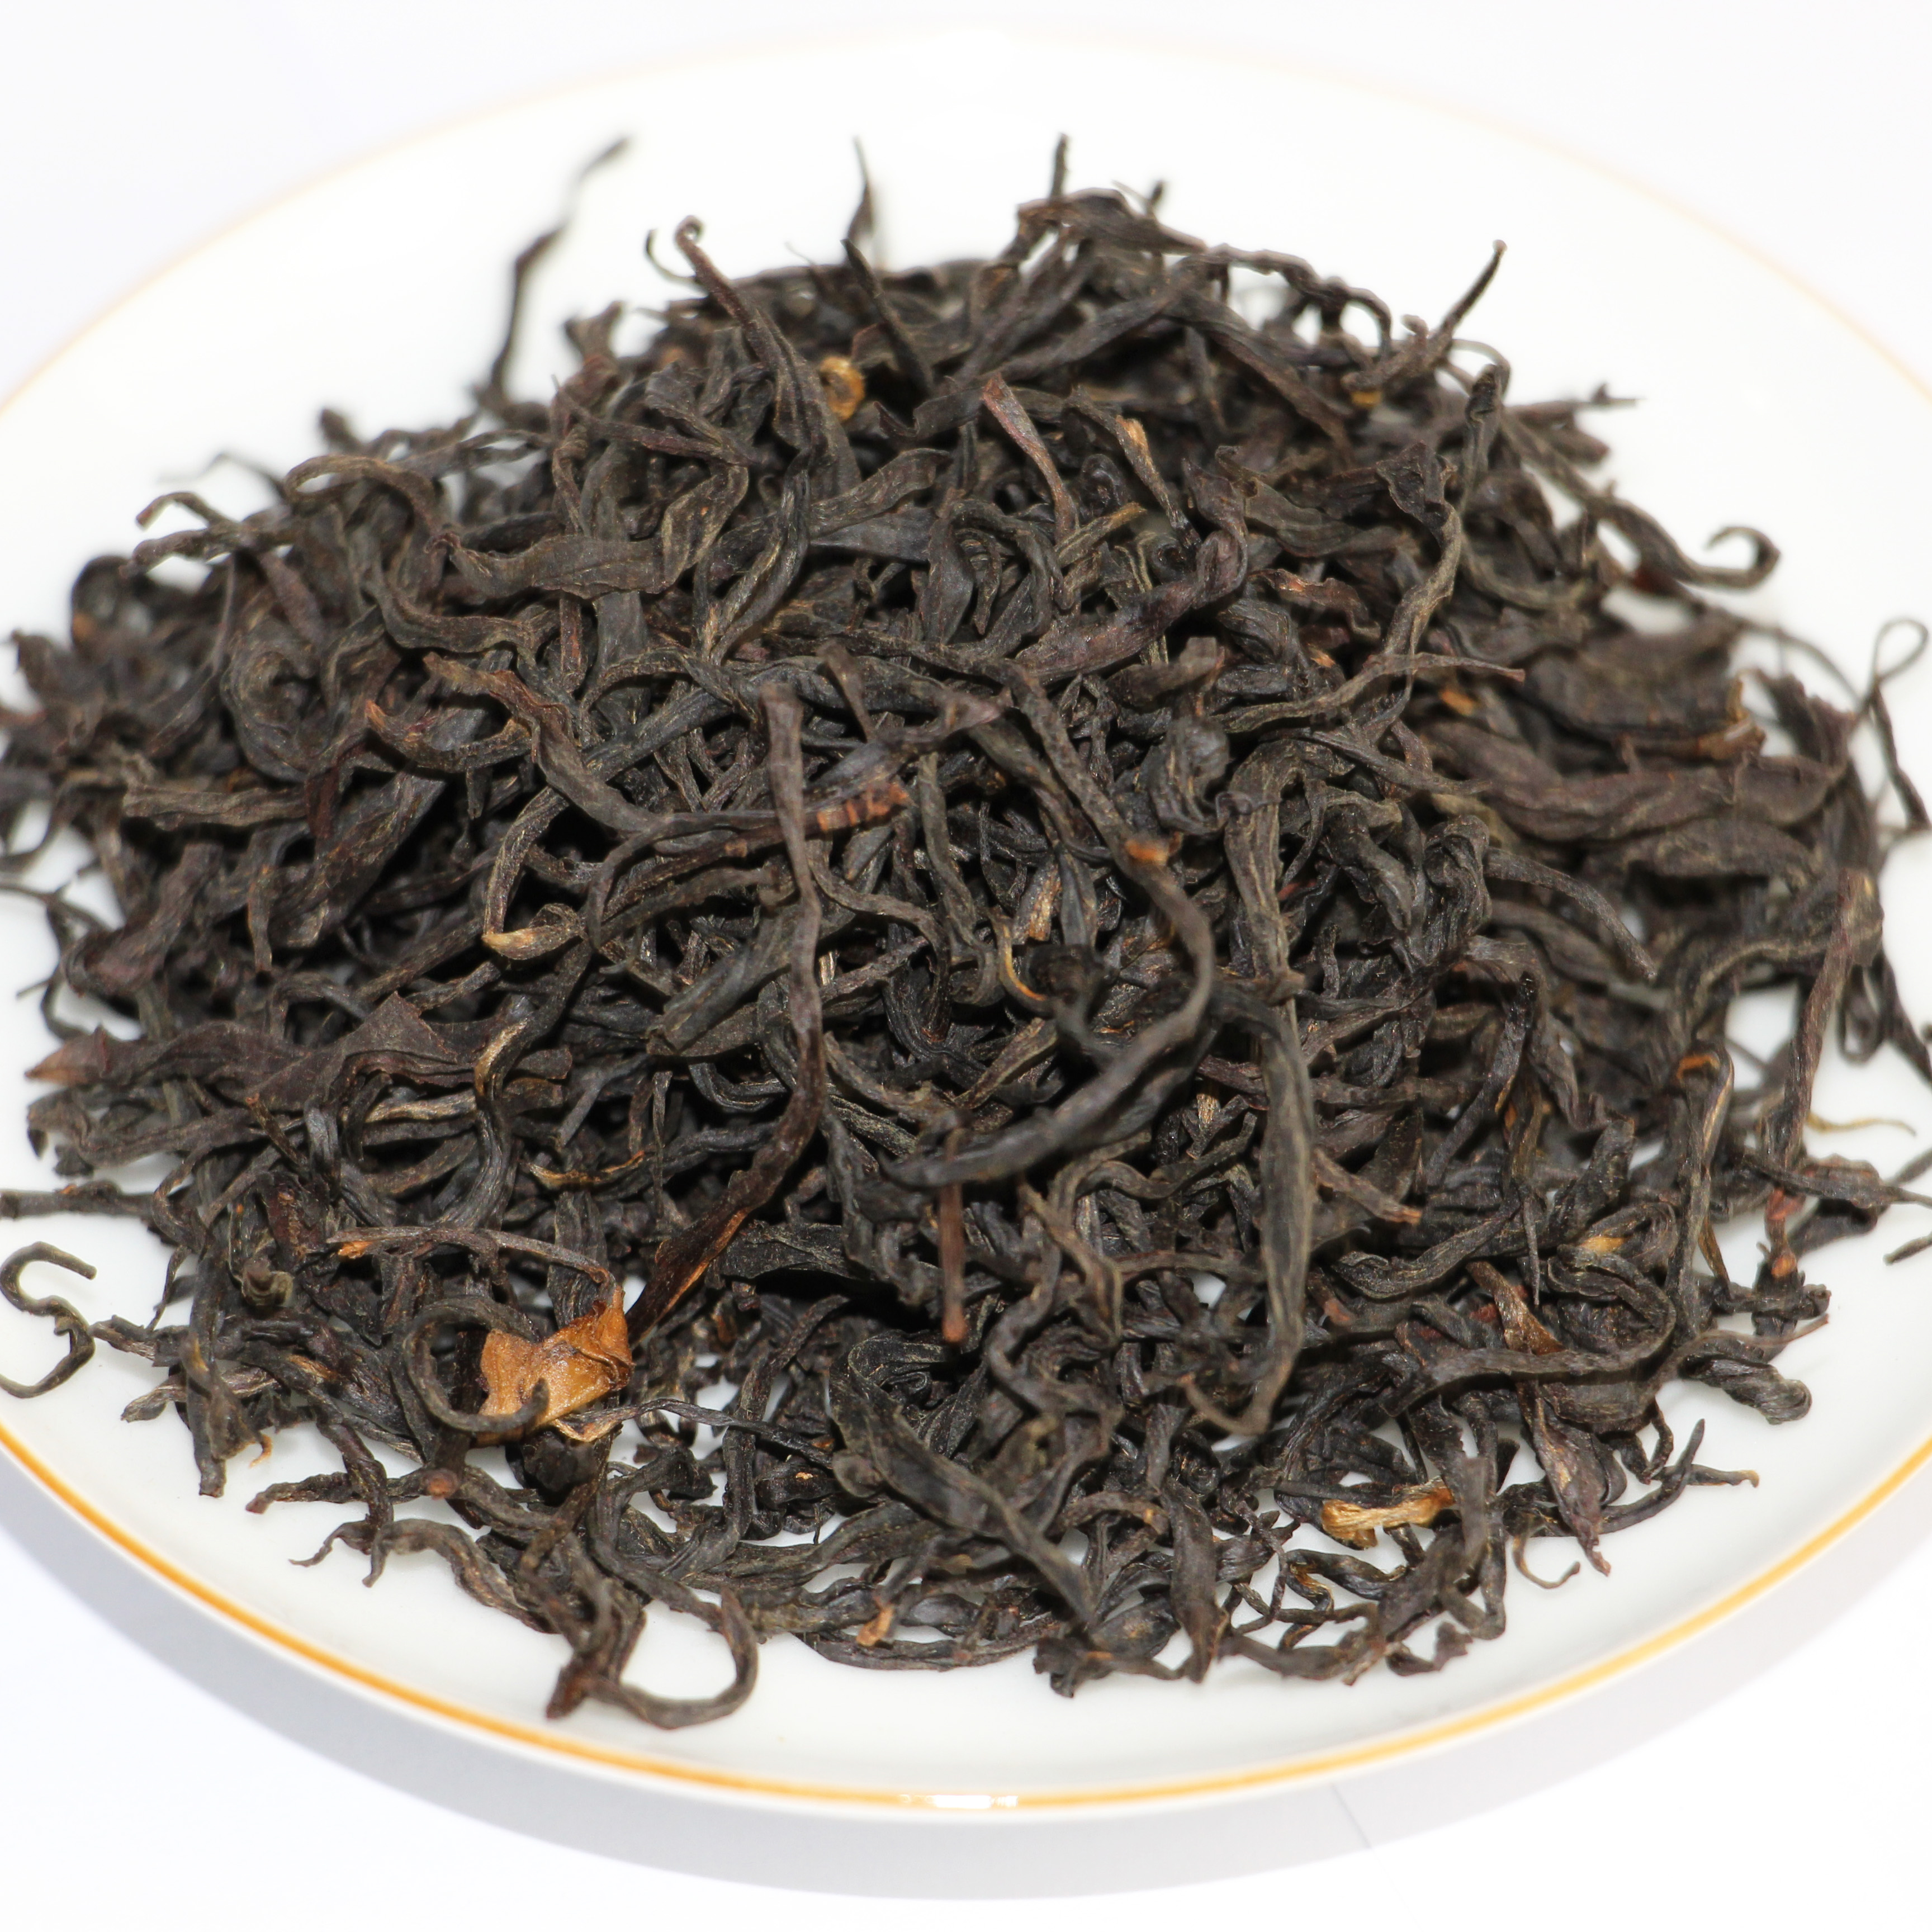 3A-organic black tea best selling online slimming organic tea - 4uTea   4uTea.com